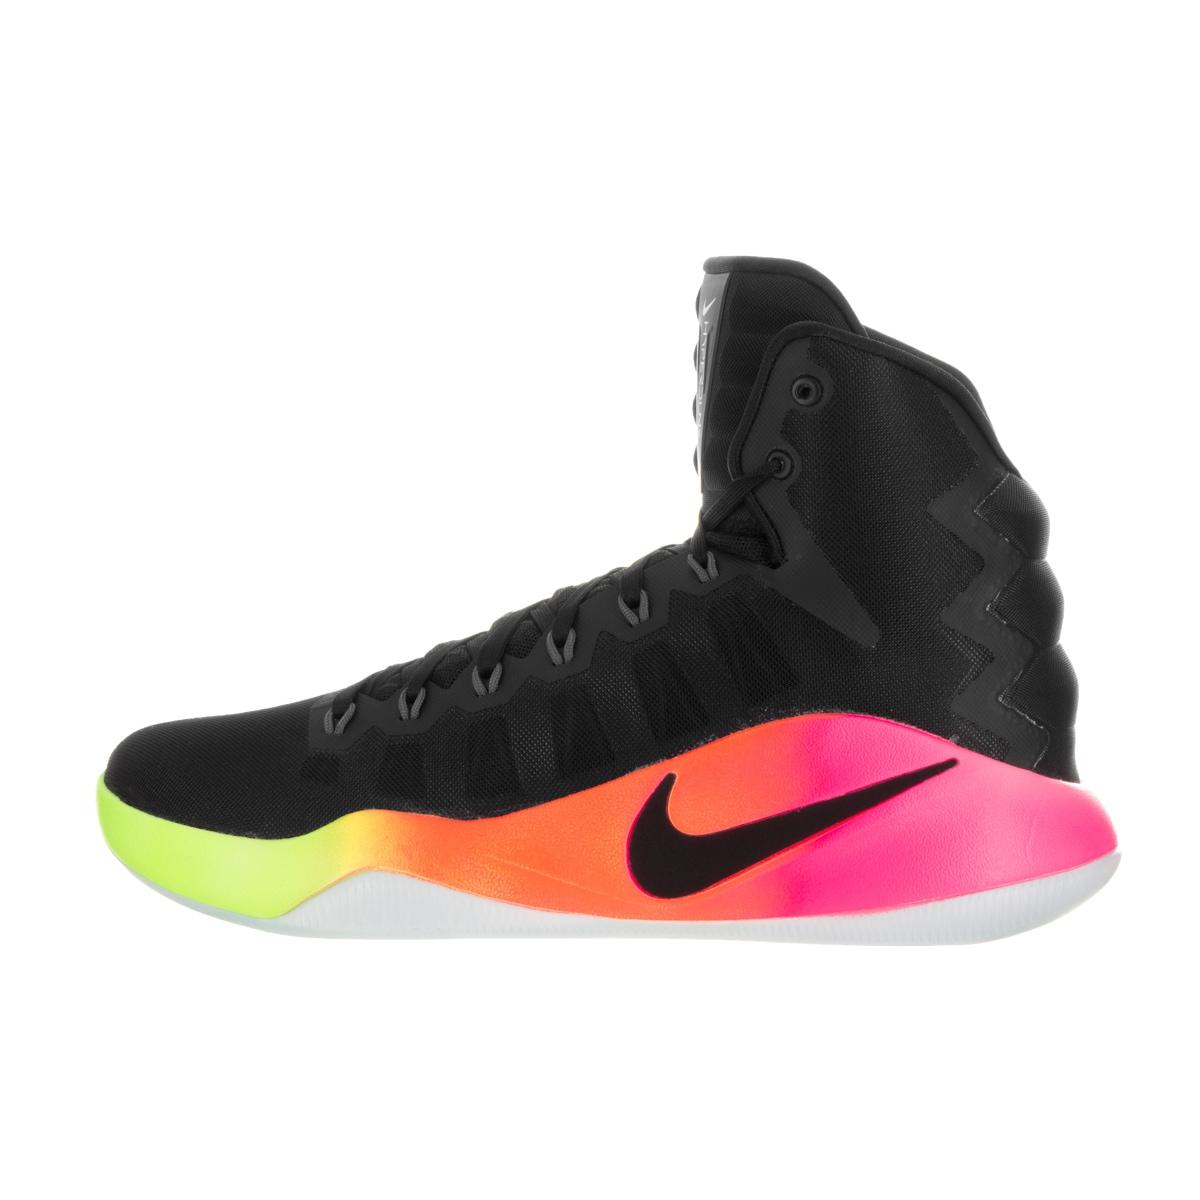 b4ee3535be1b Shop Nike Men s Hyperdunk 2016 Black Black Pink Blast Volt Basketball Shoe  - Free Shipping Today - Overstock - 13392233